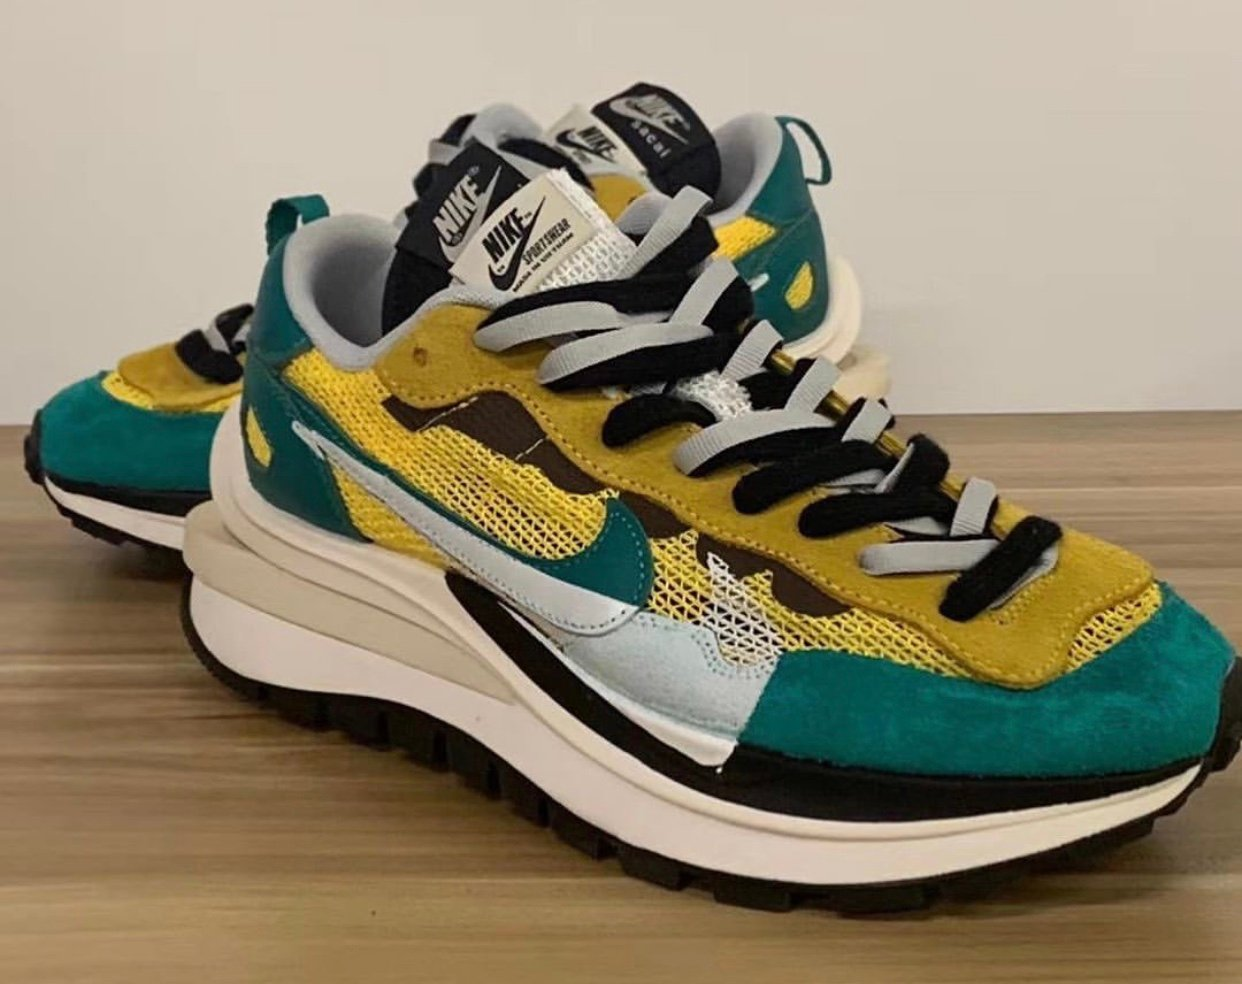 Sacai Nike VaporWaffle Tour Yellow Stadium Green CV1363-700 Release Date